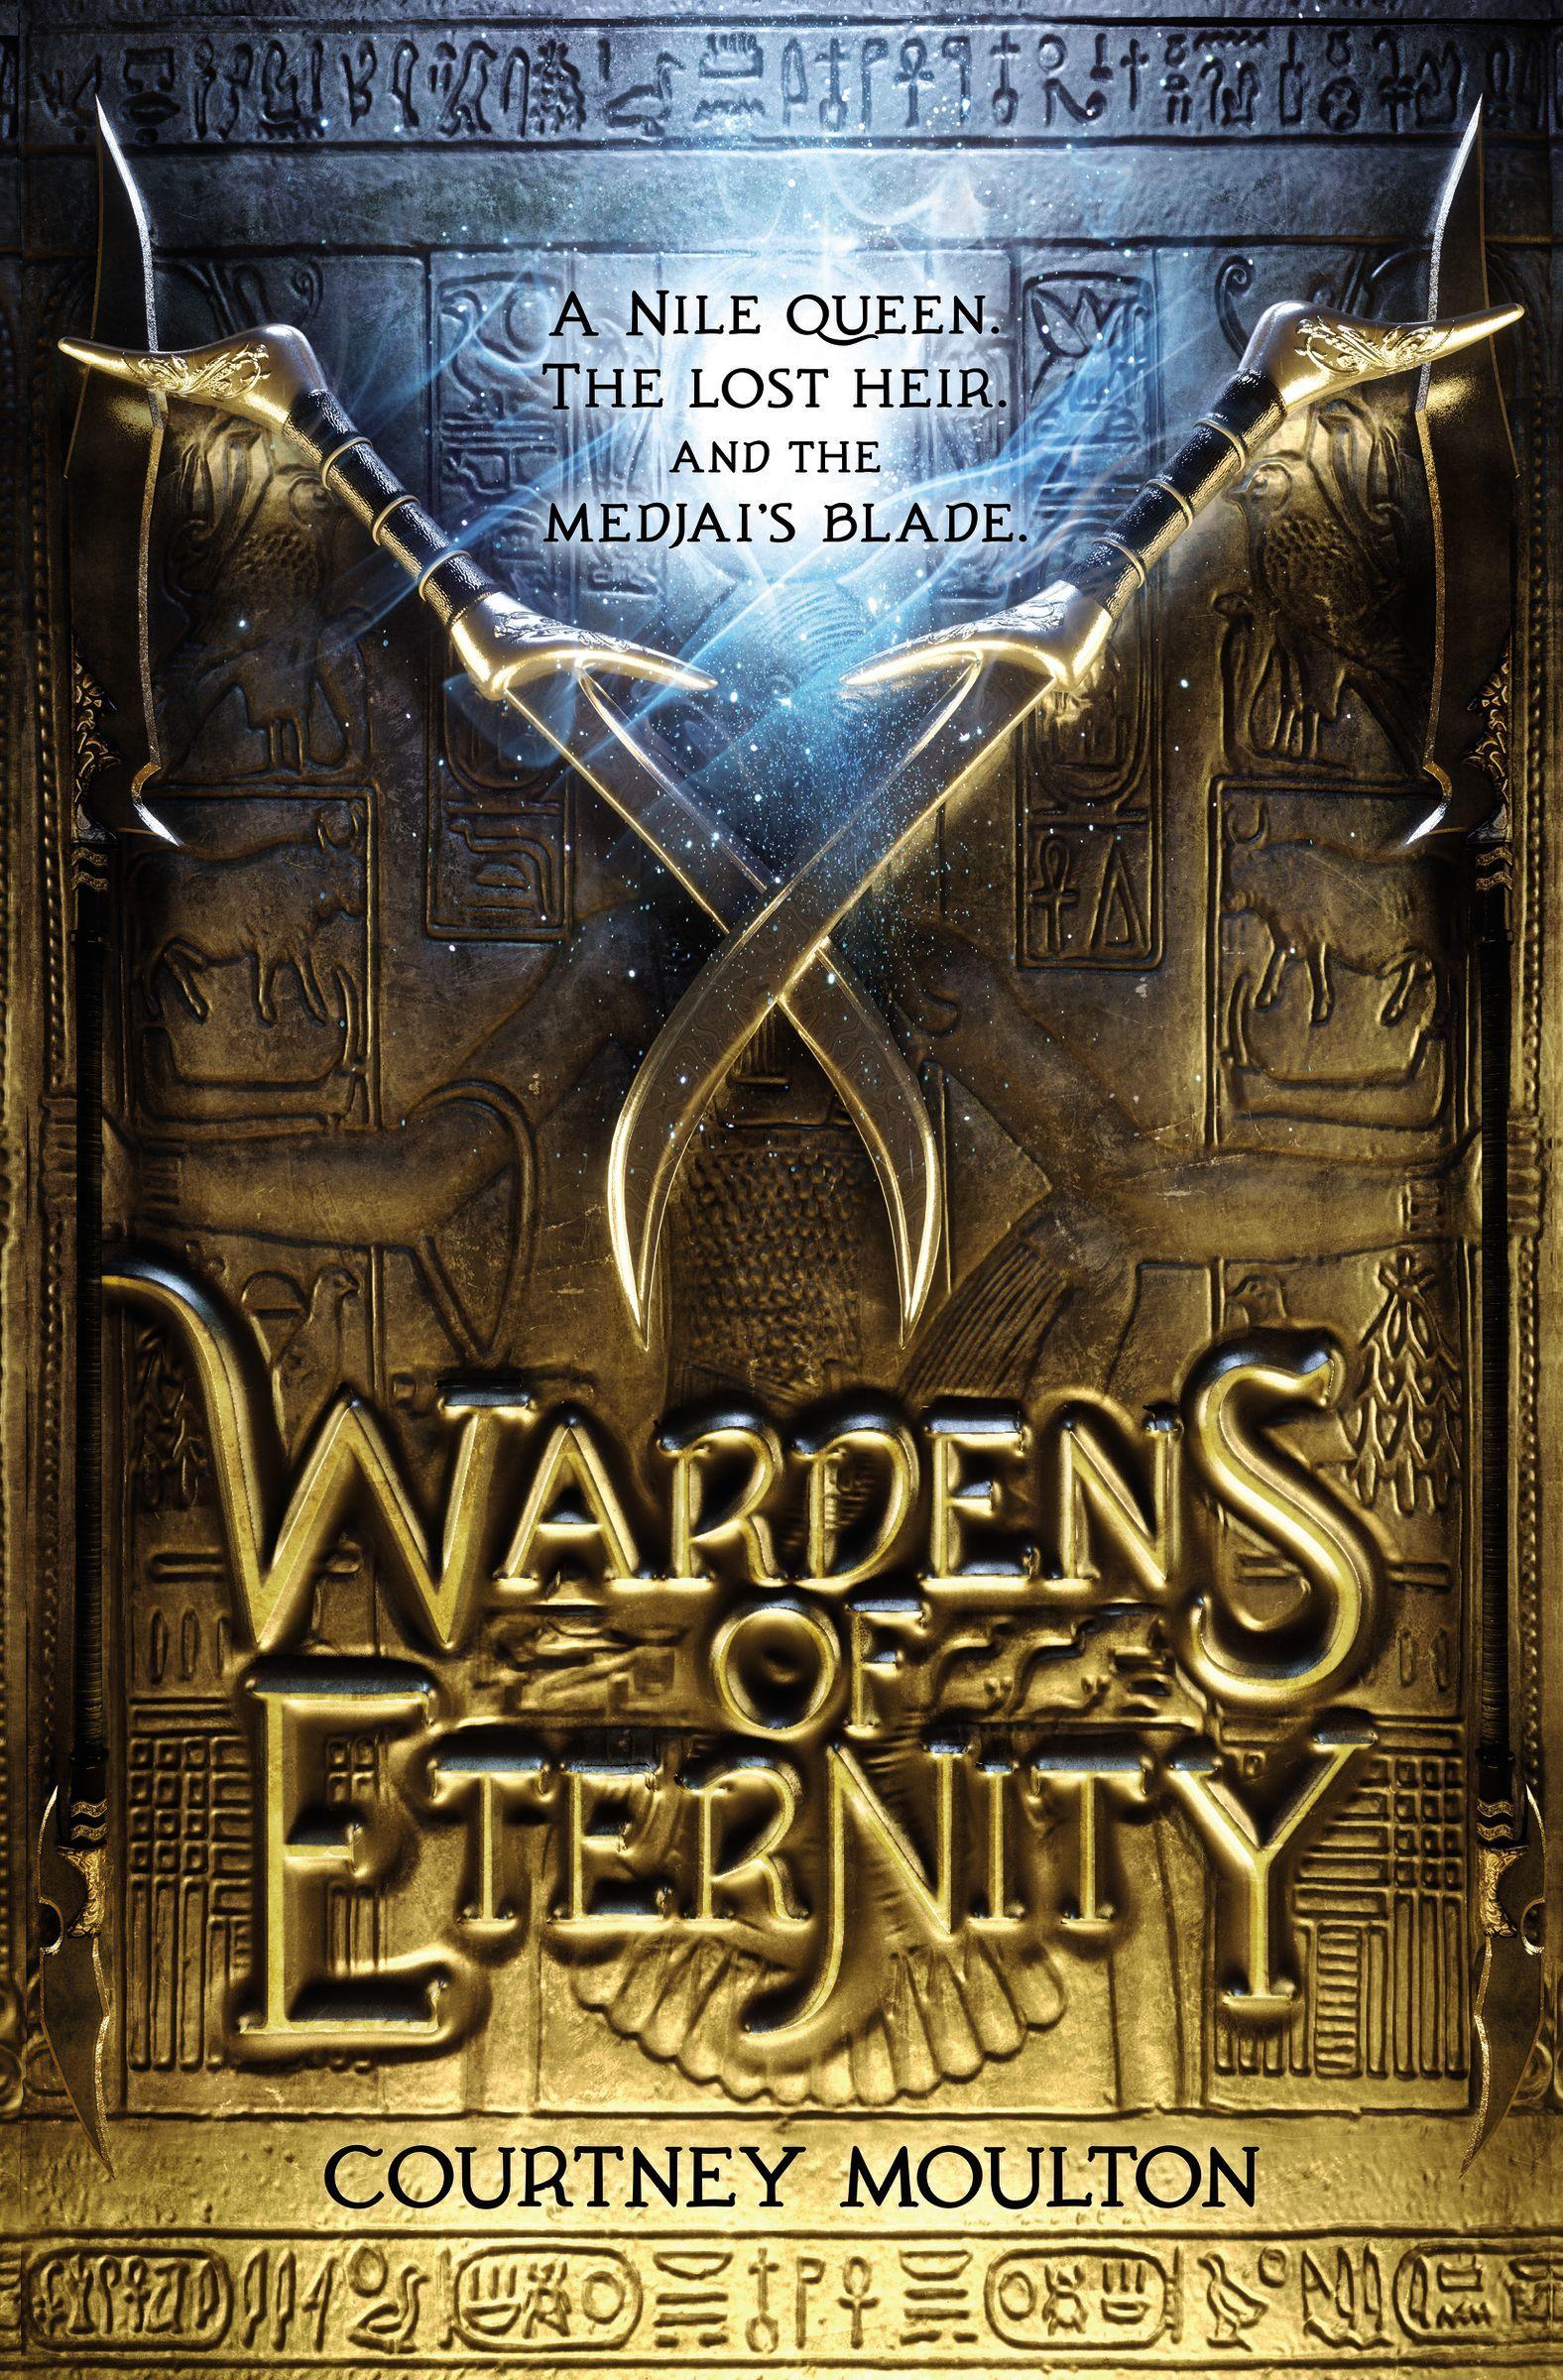 Wardens of Eternity - Courtney Allison Moulton